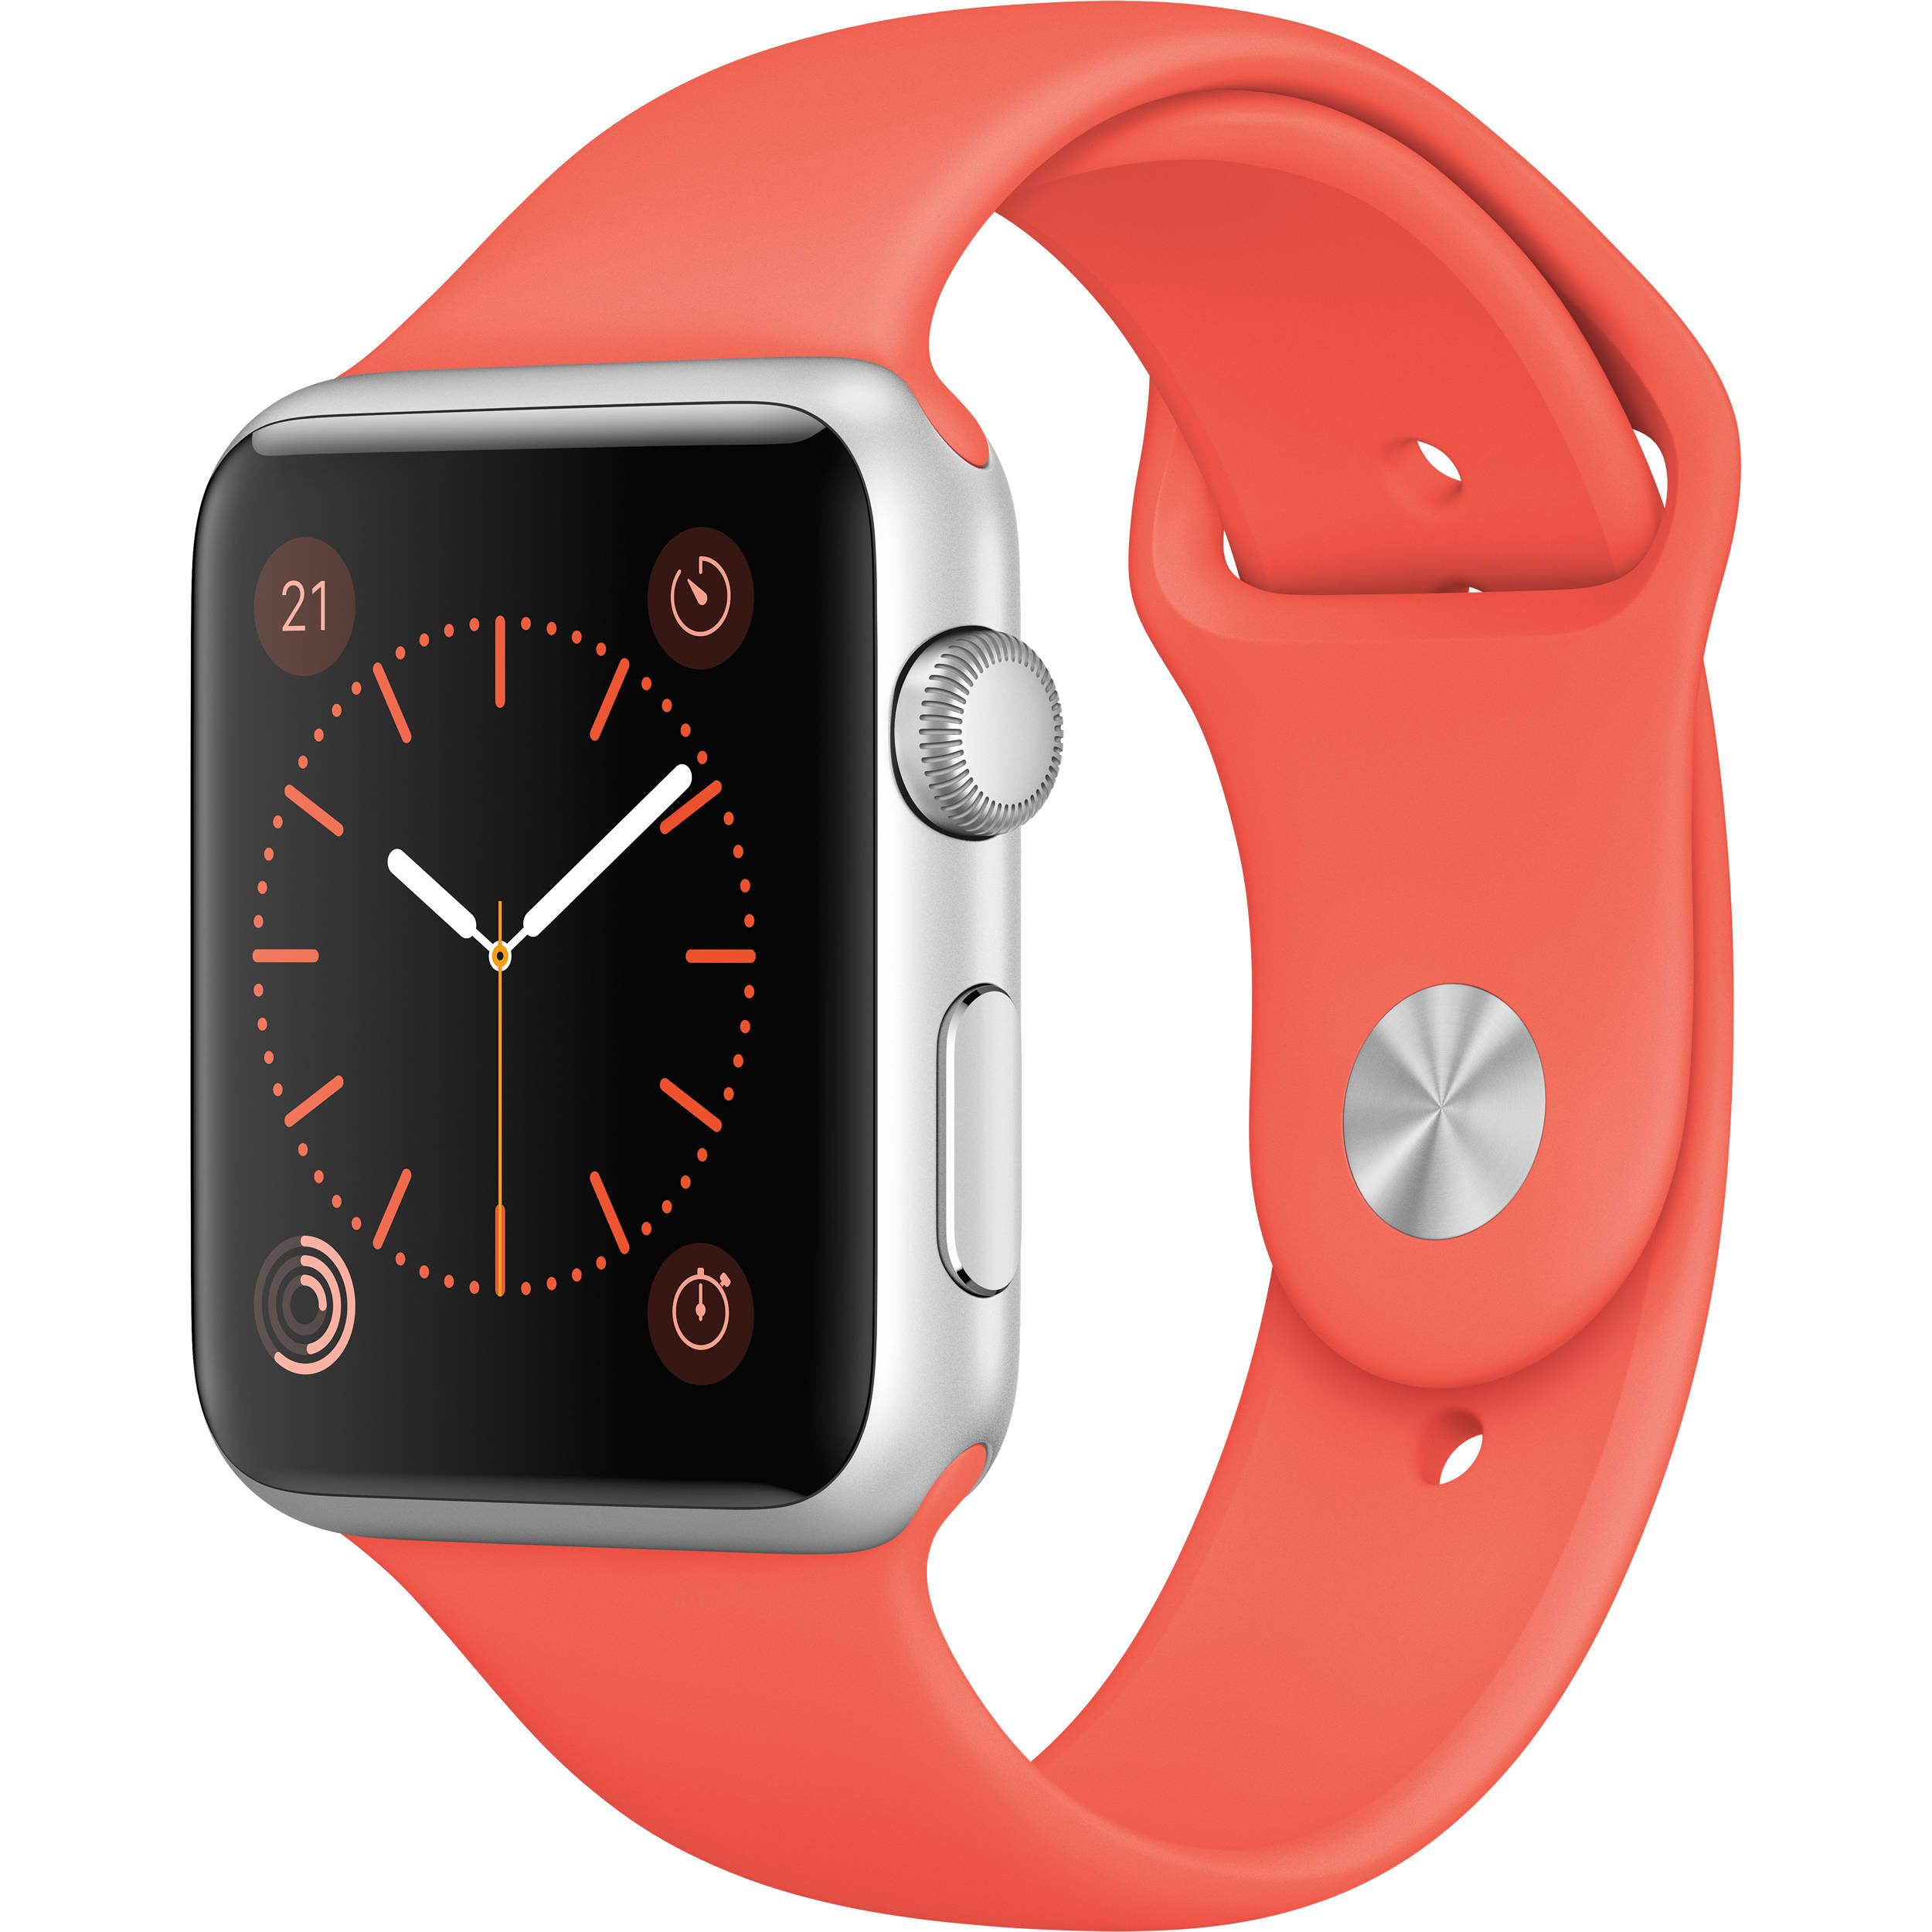 reputable site 3d5fc f4514 Apple Watch Sport 42mm Smartwatch (2015, Silver Aluminum Case, Apricot  Sport Band)